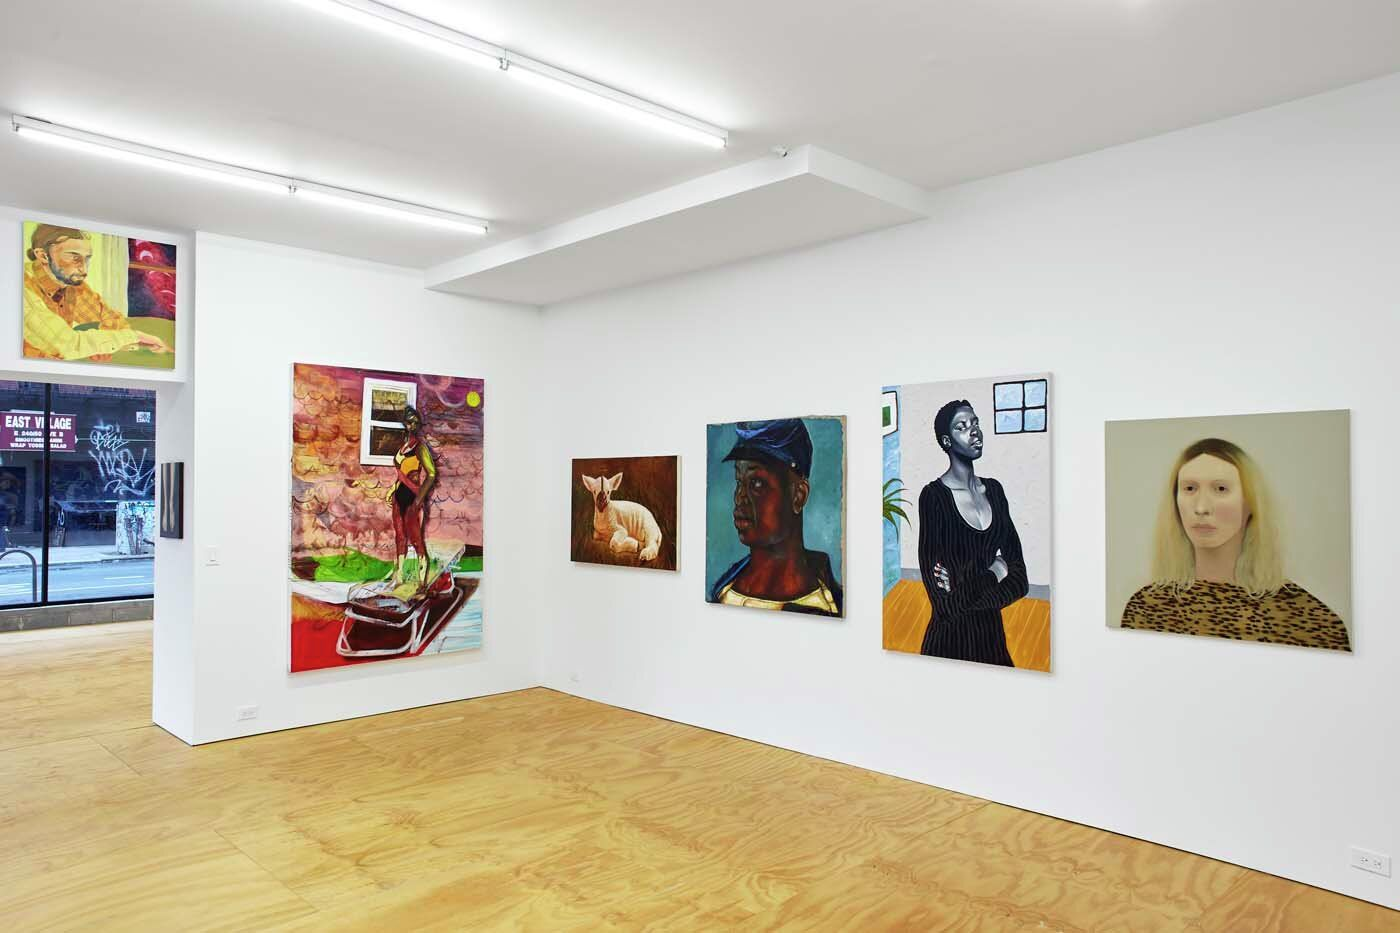 Anthony Cudahy and Oli Epp, Friend Zone, Half Gallery, New York (US) 28 janvier - 24 février 2021